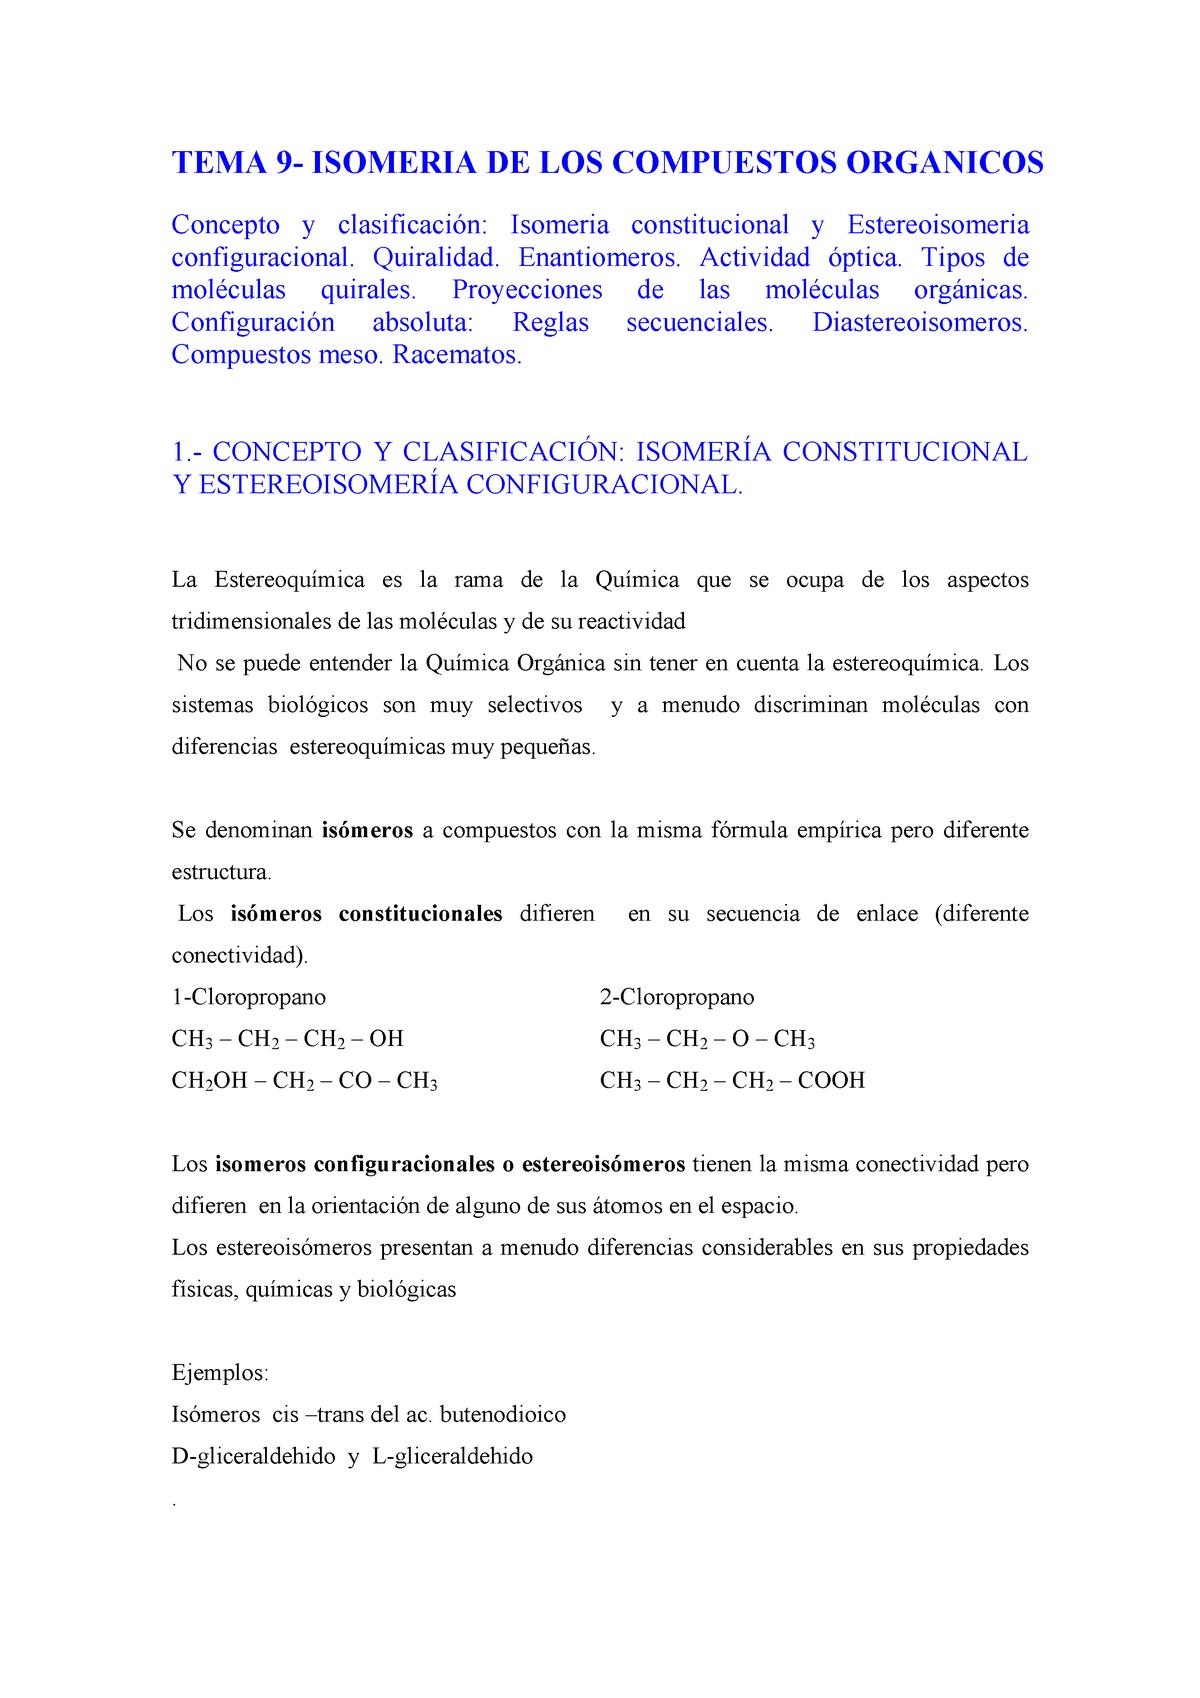 Estereoisomeria Apuntes 1 Química General Upv Studocu